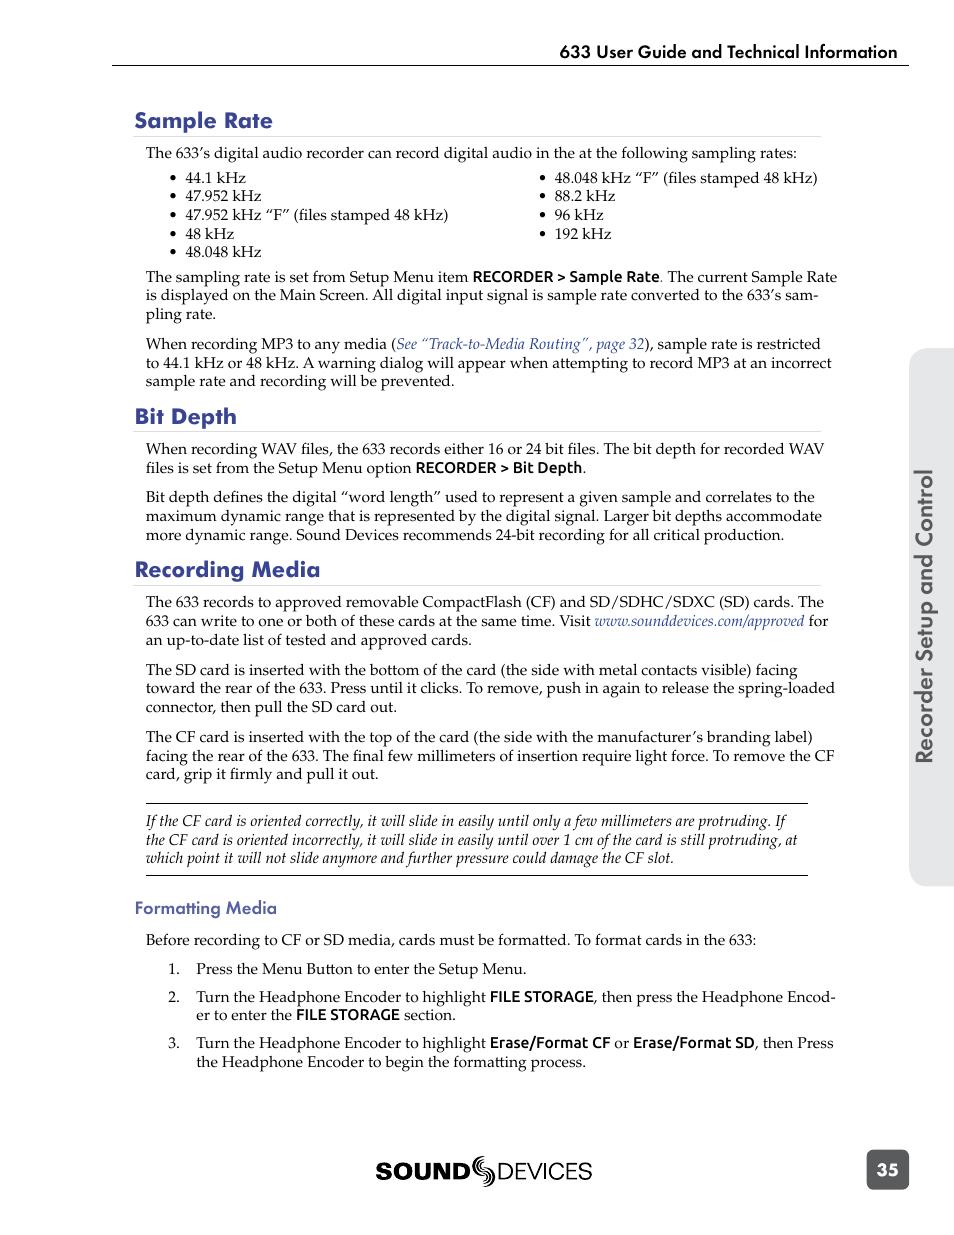 Sample rate, Bit depth, Recording media | Sound Devices 633 User